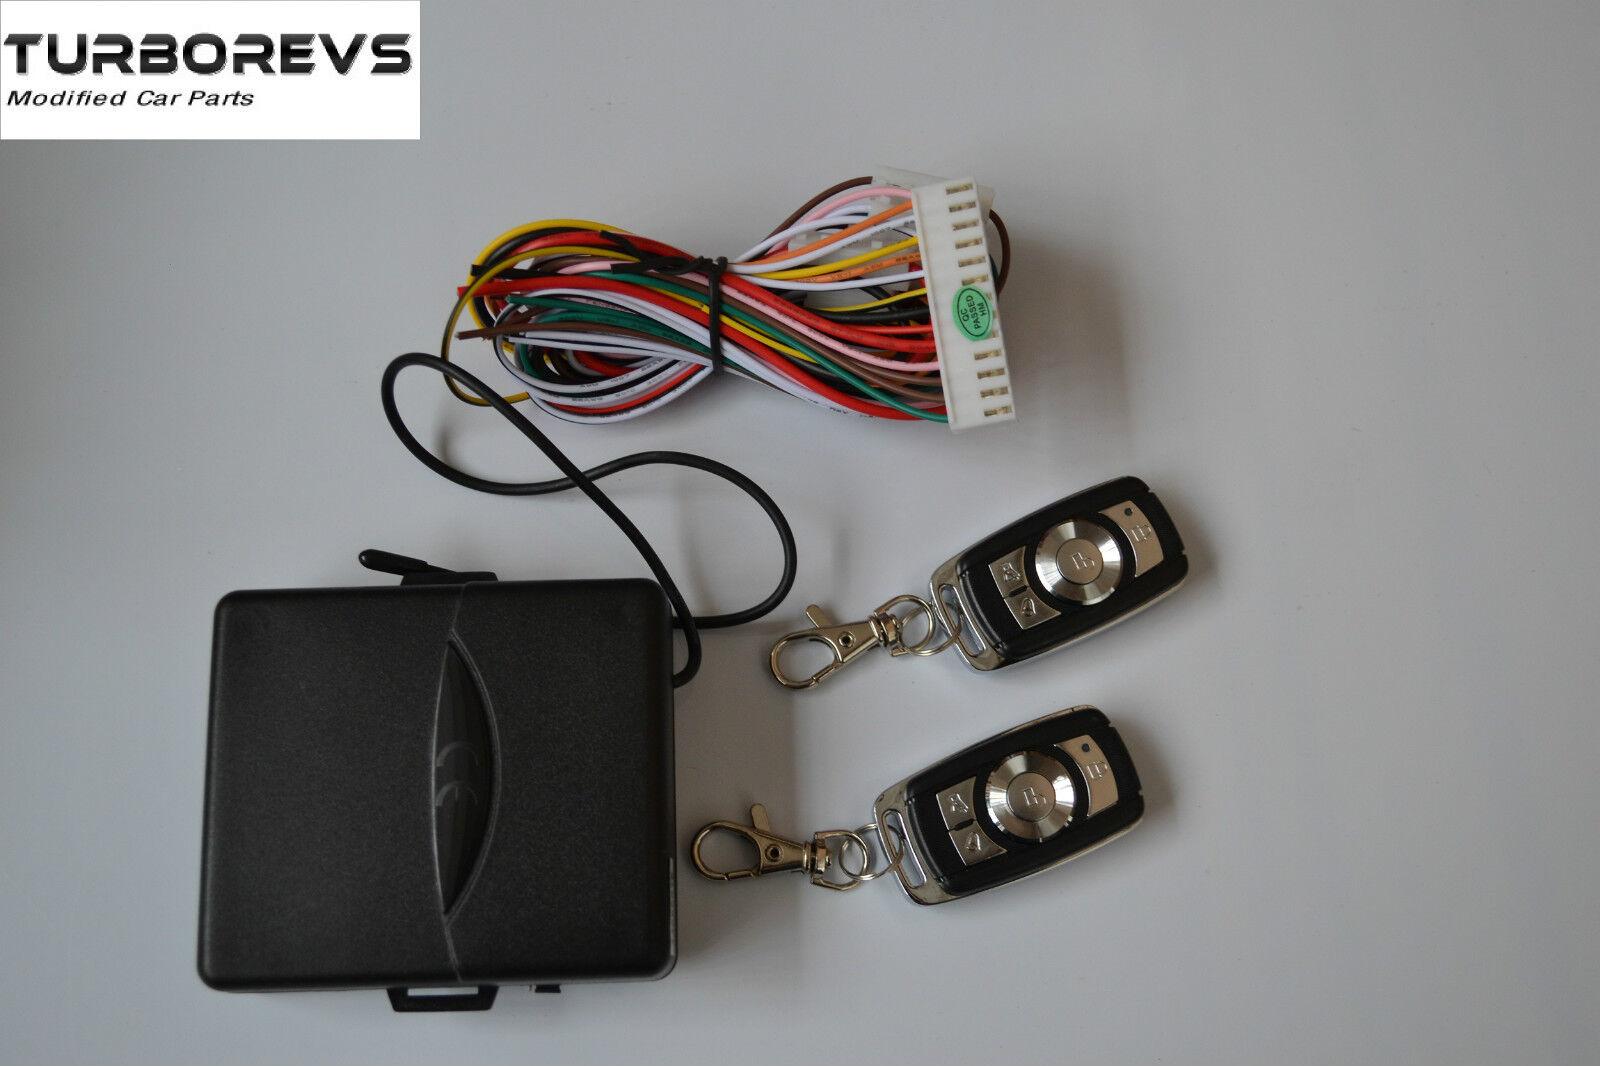 Remote Keyless Entry Central Locking Kit Honda Jazz Crv Civic Accord Interlock Wiring Diagram 97